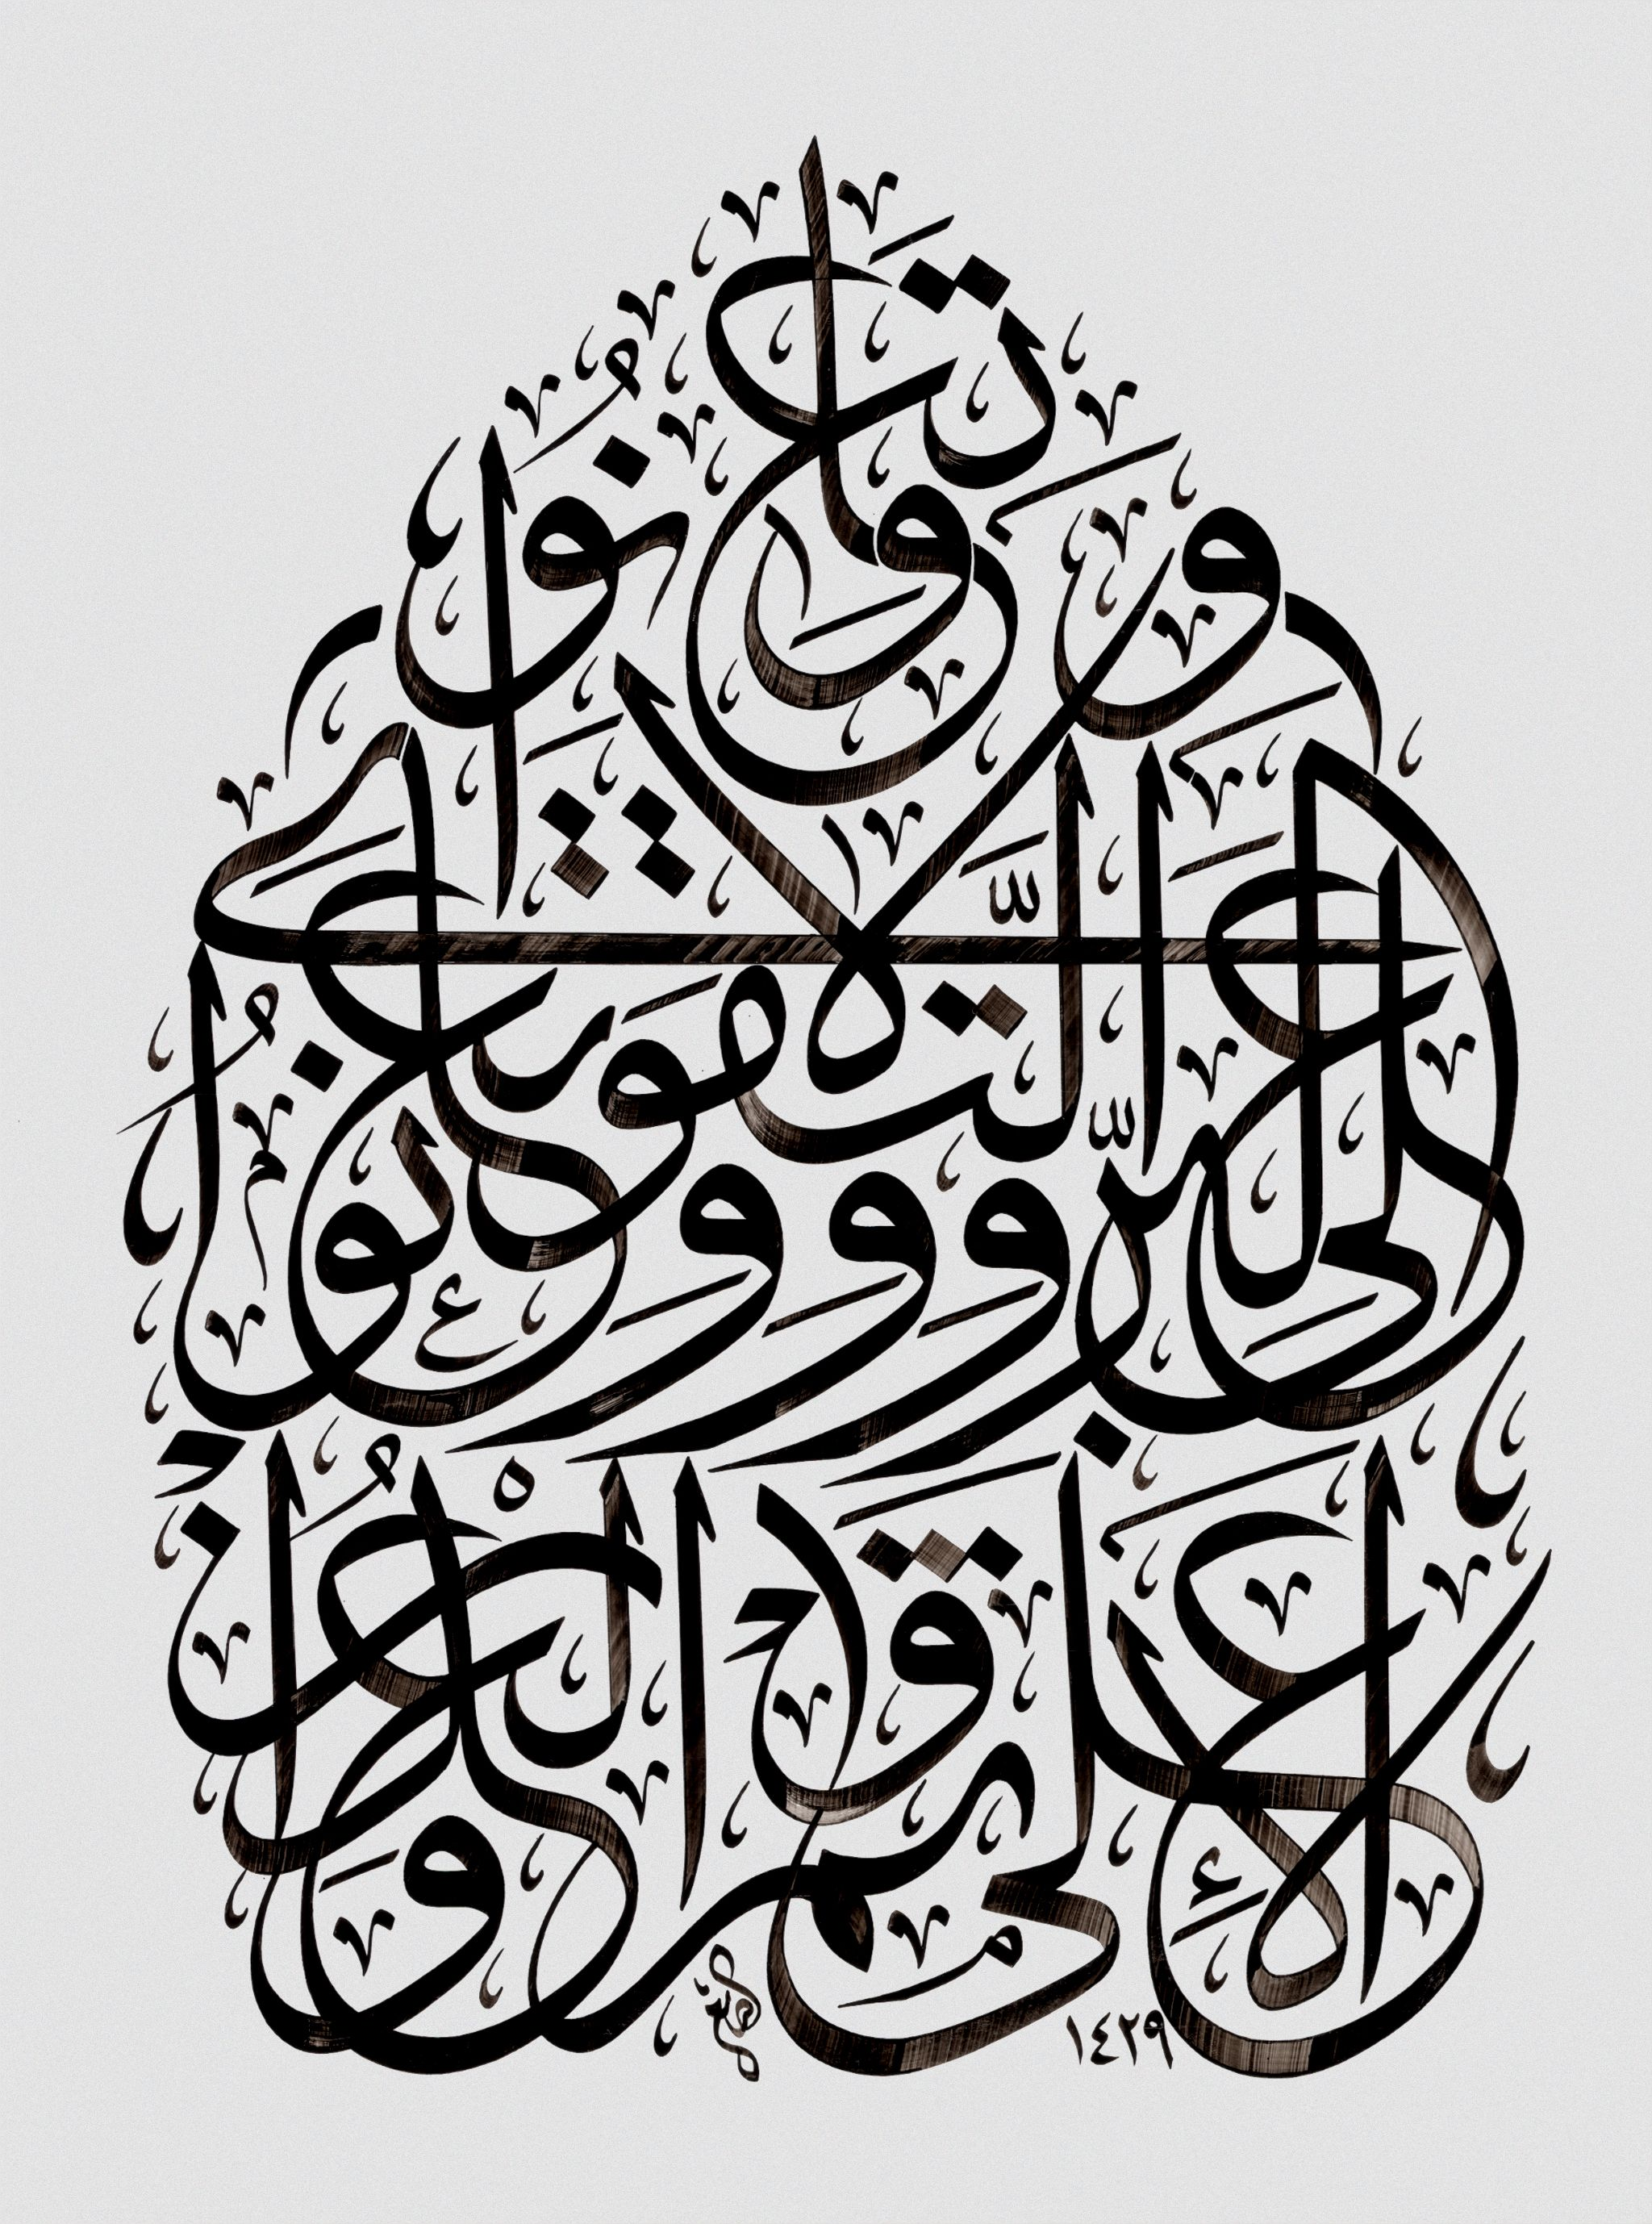 Qs Al Maidah Ayat 48 : maidah, تعاونوا, على, البر, التقوى, الإثم, والعدوان, سورة, المائدة, آية, Islamic, Calligraphy,, Patterns